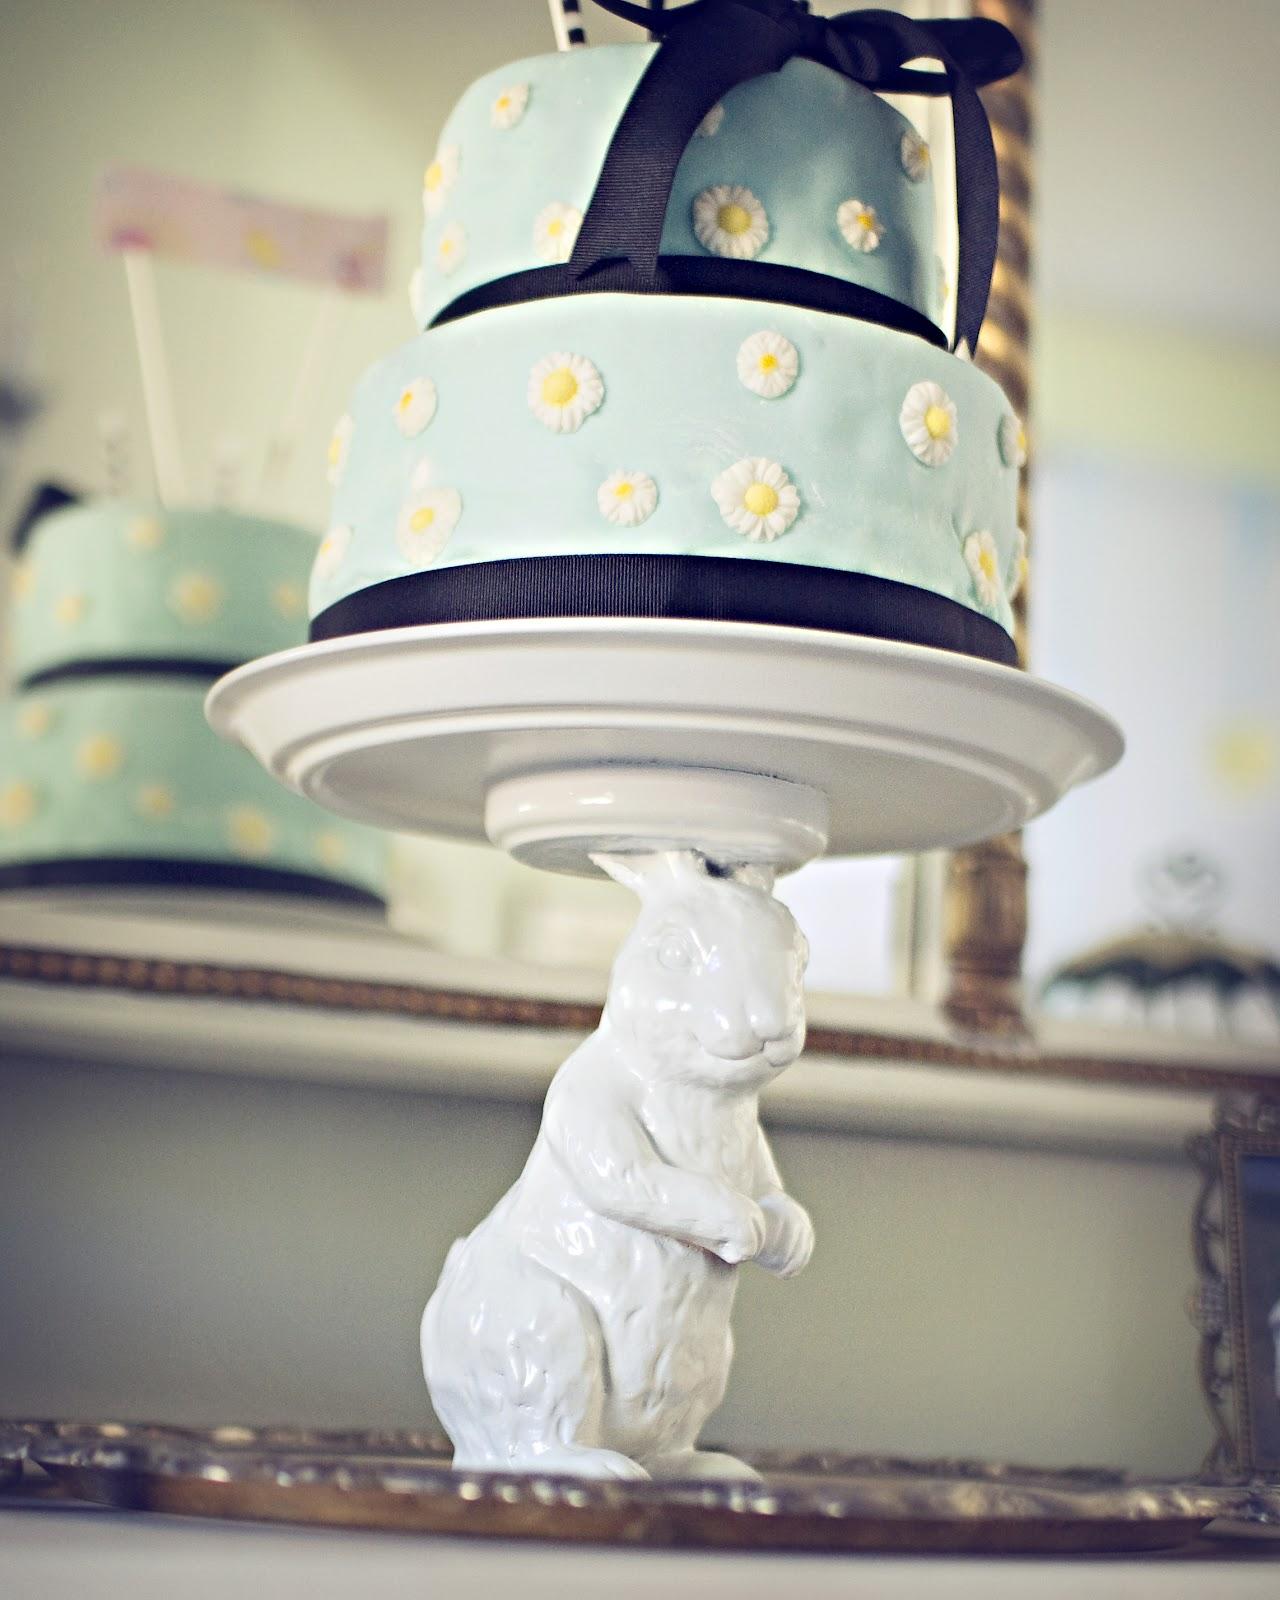 Pottery Barn Bunny Cake Stand